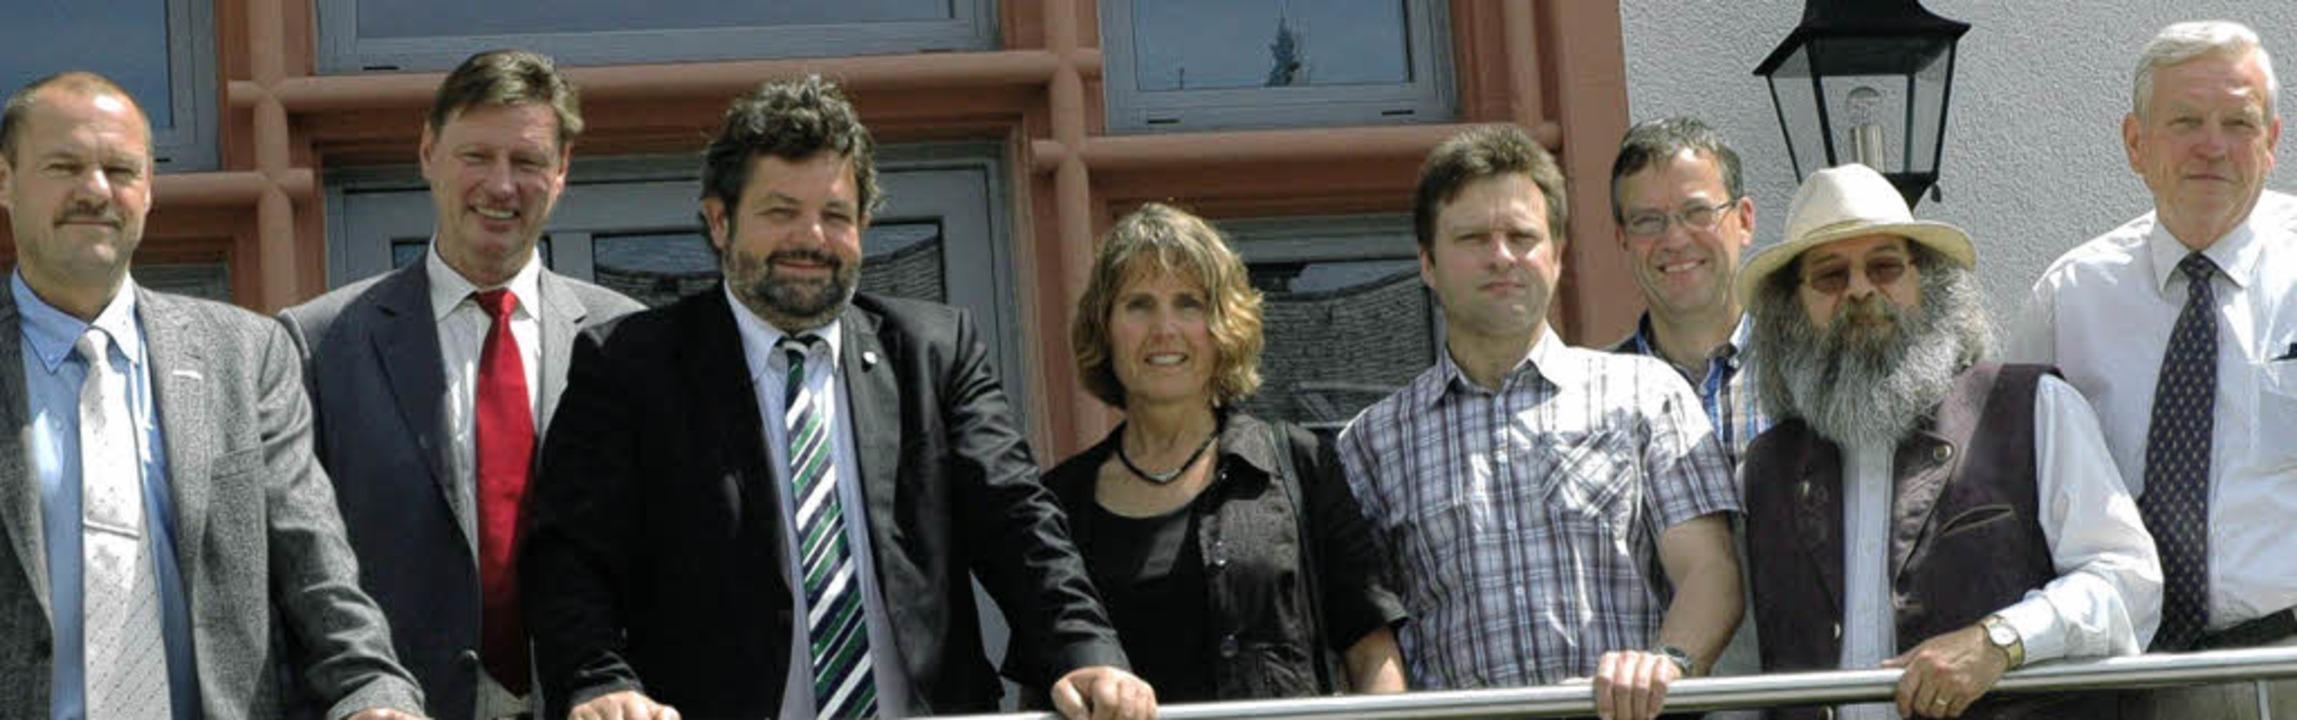 Gruppenbild mit Abgeordnetem: Jörg Oeh...ieter Folles, Bernd Struck (von links)  | Foto: Stefan Sahli